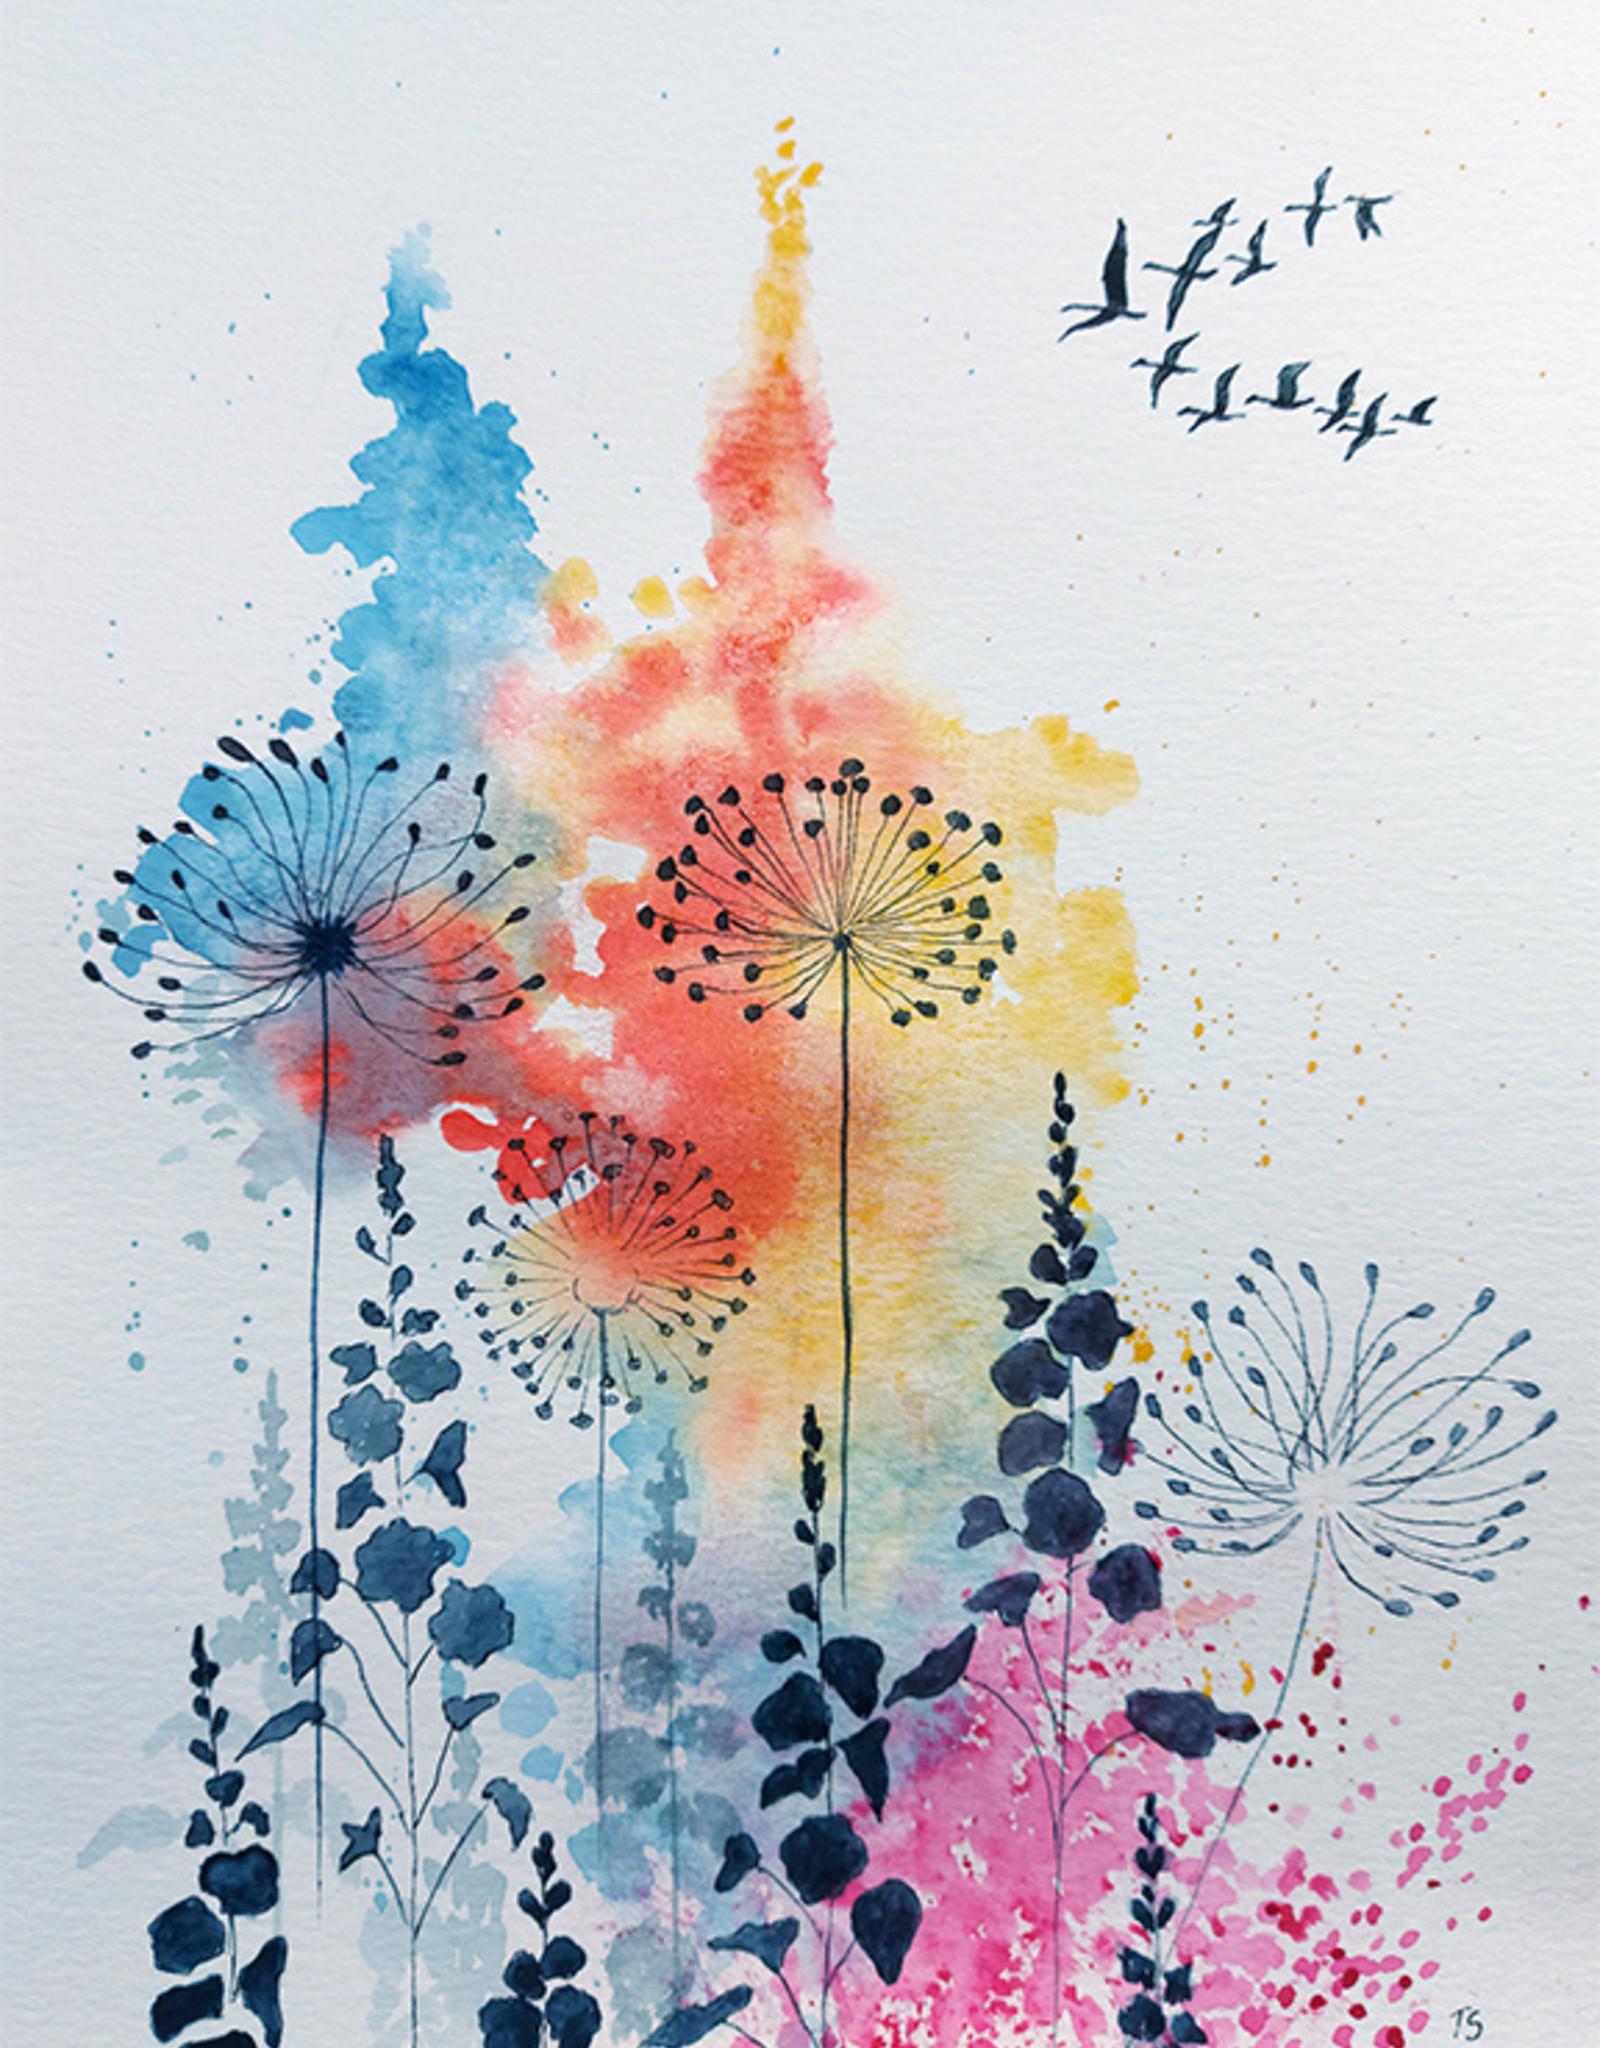 Tamara S Watercolour/Drawing Art Class Fall Flowers Wed Oct 13 1:00 to 3:00 pm